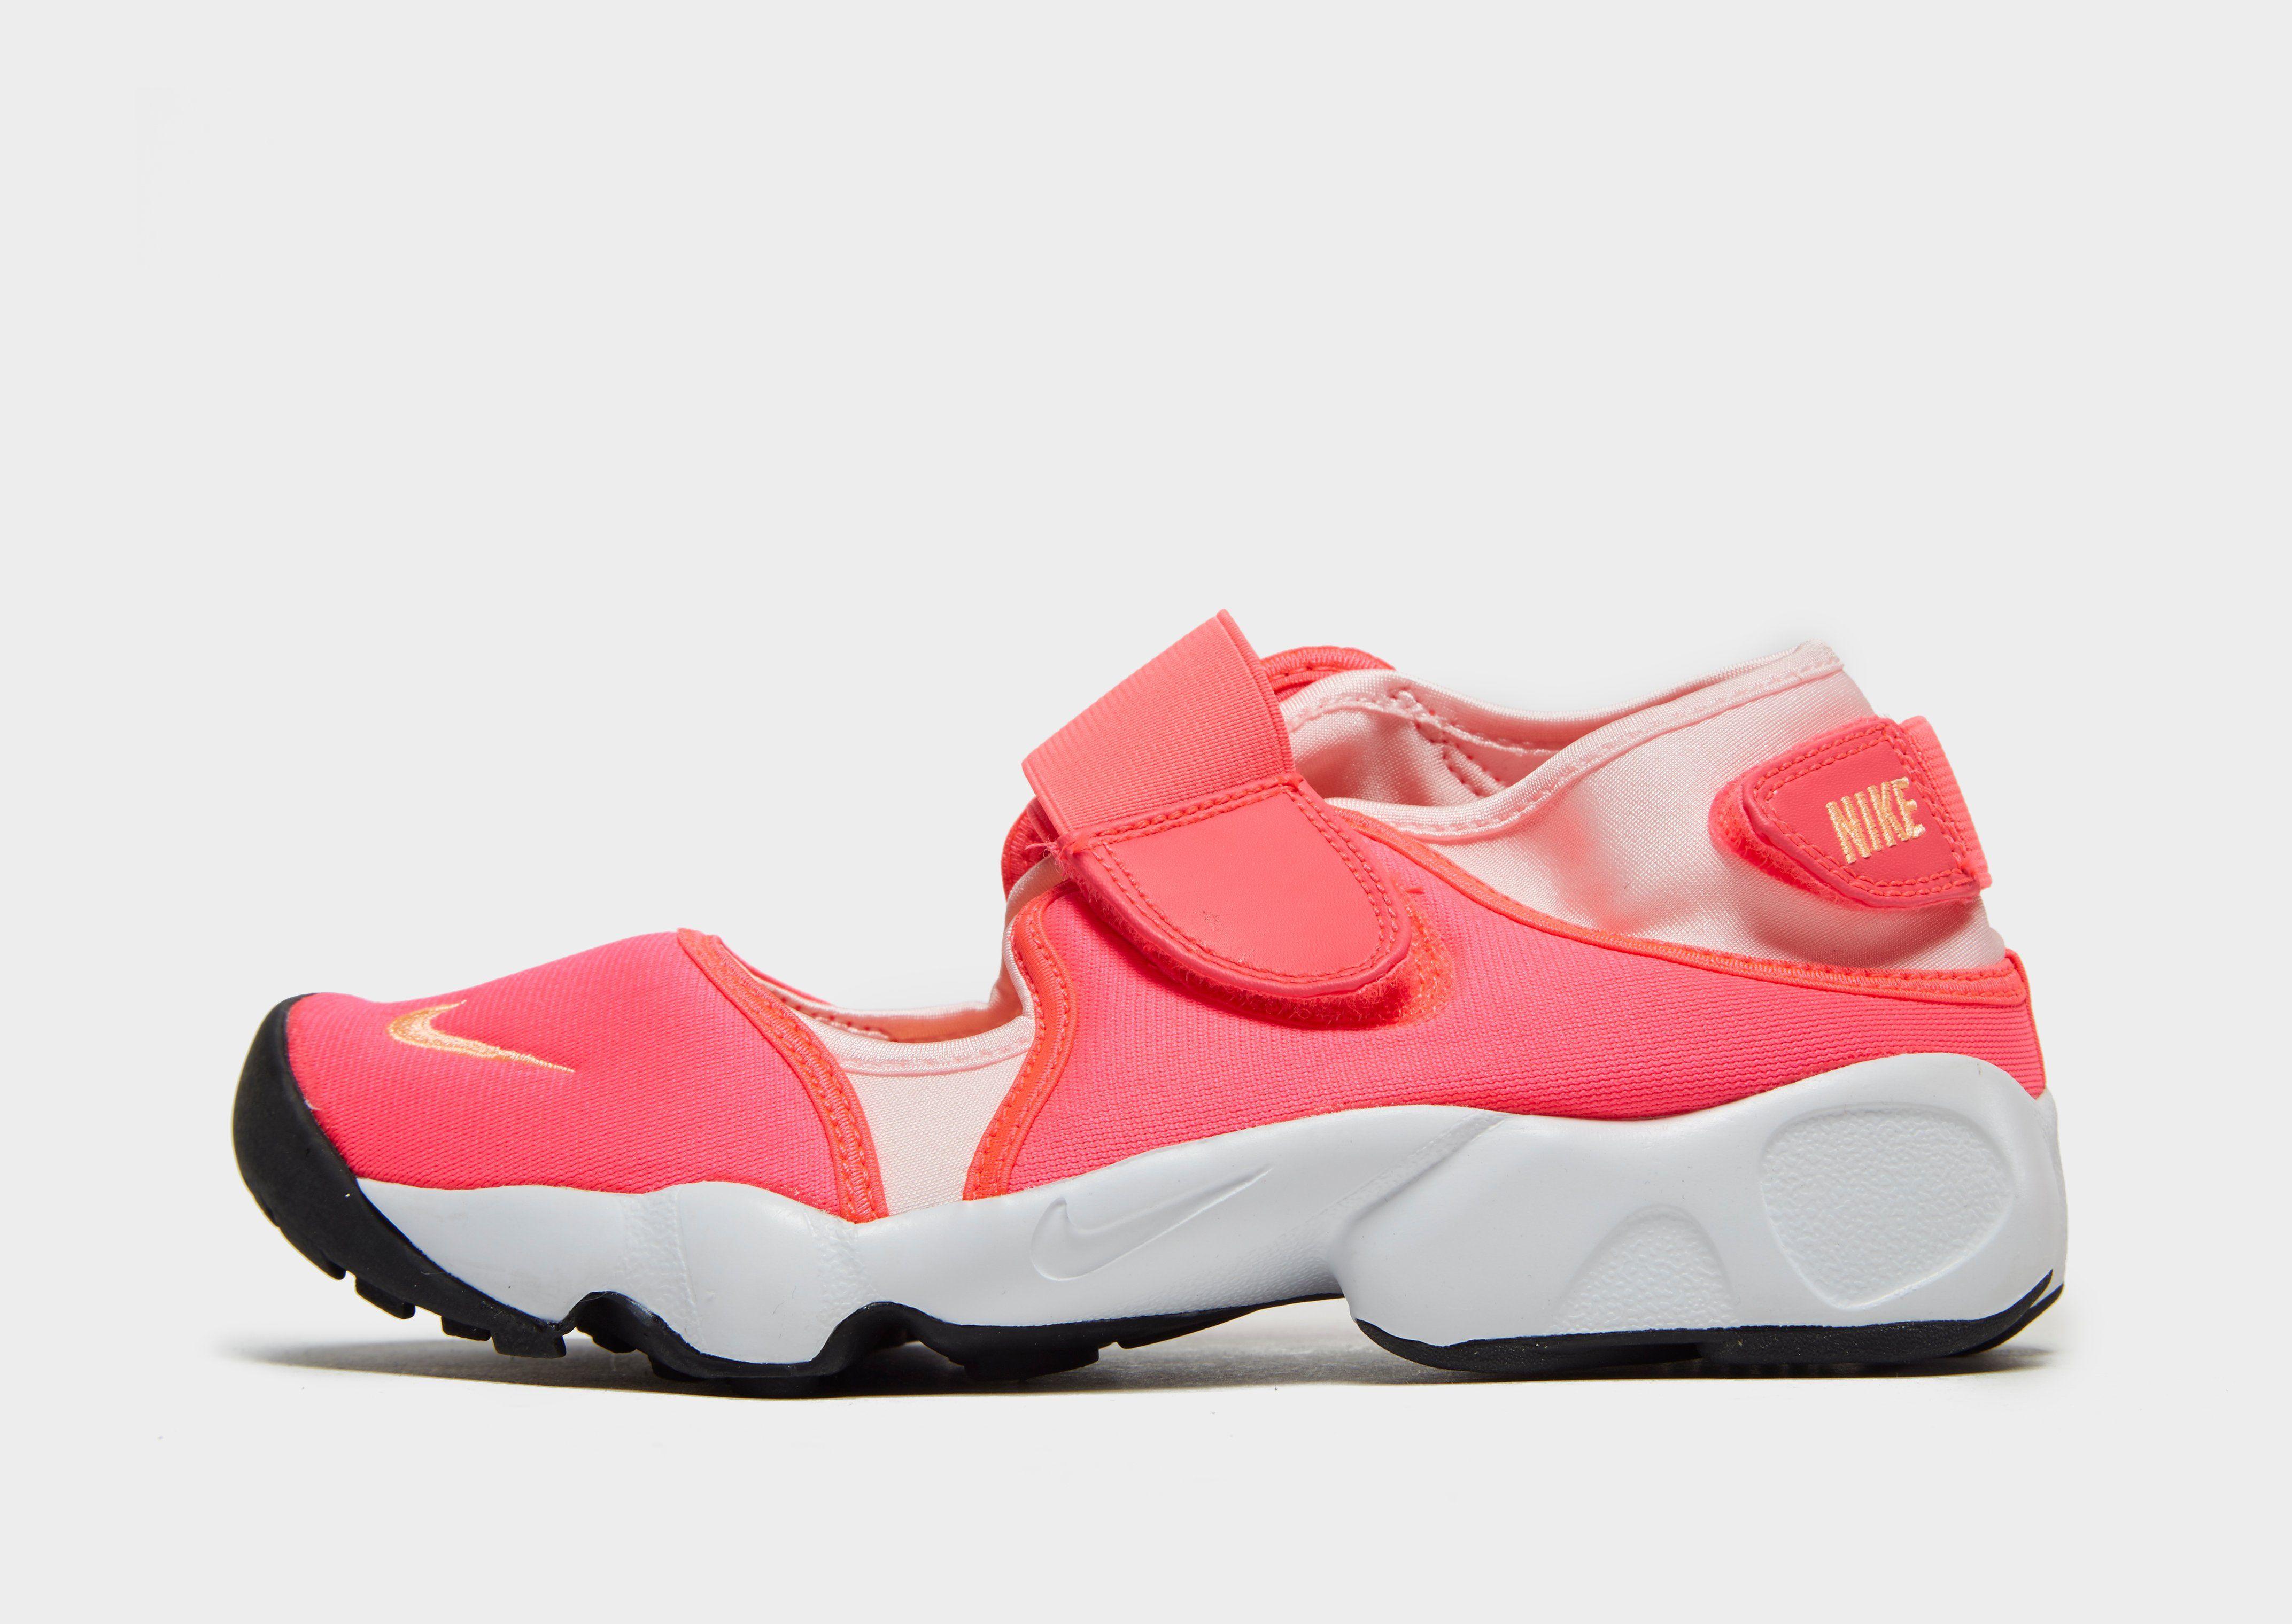 83b3ae201038f9 Kids - Nike Flip-Flops   Sandals